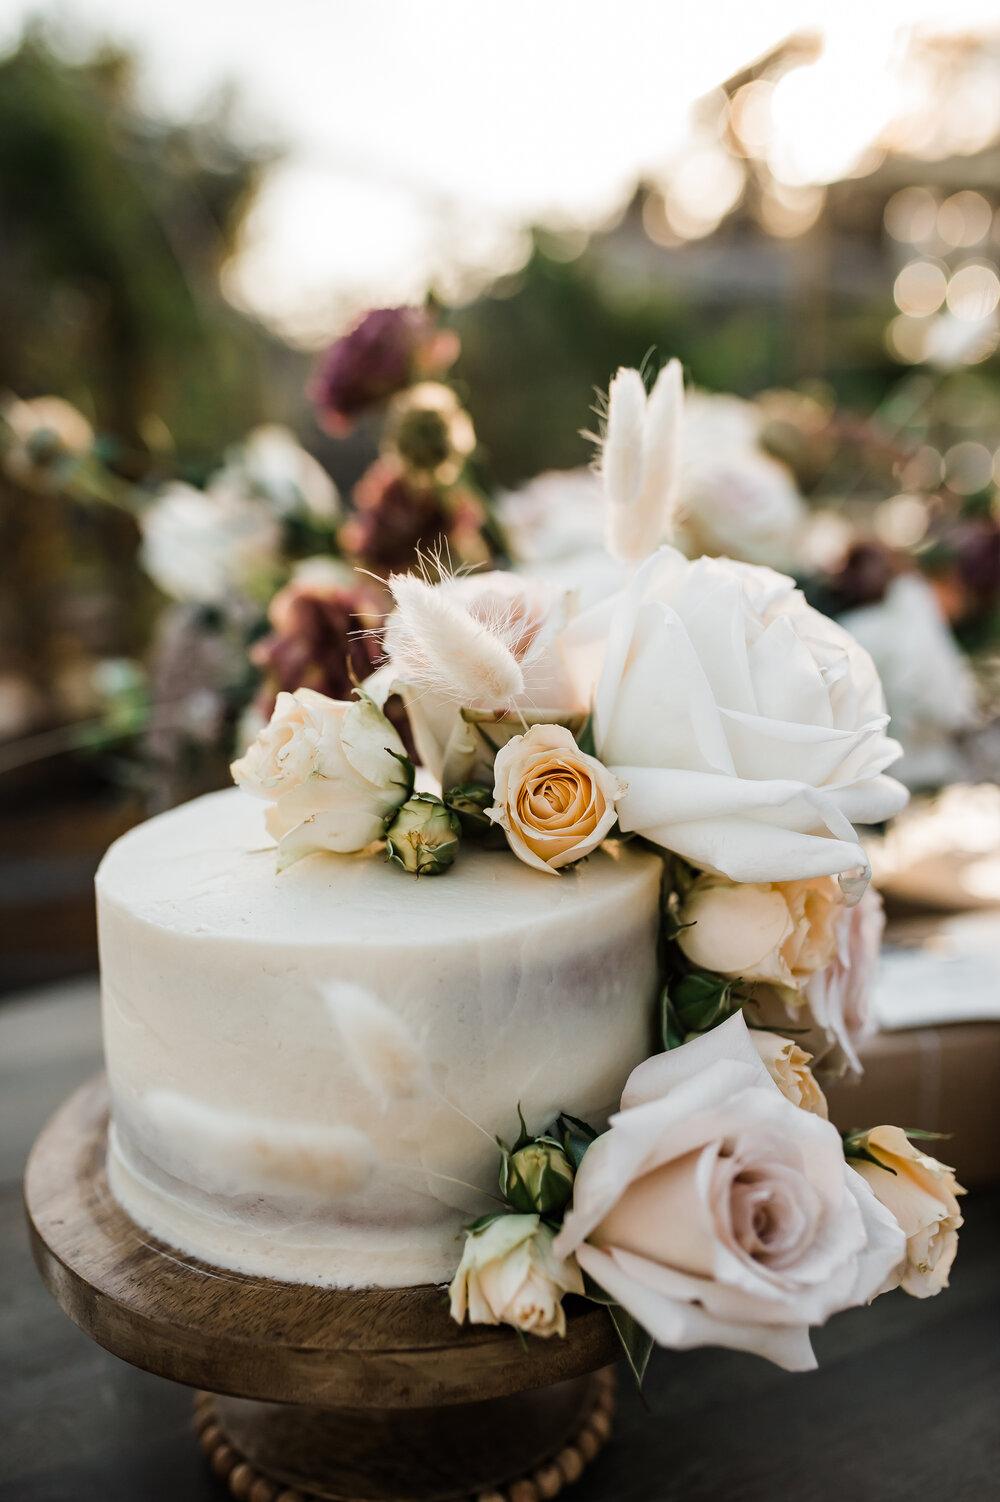 www.santabarbarawedding.com | The Tavern at Zaca Creek | Events by Fran | Michelle Ramirez Photography | Tangled Lotus | Amigo Party Rentals | Posies and Sugar | Wedding Cake